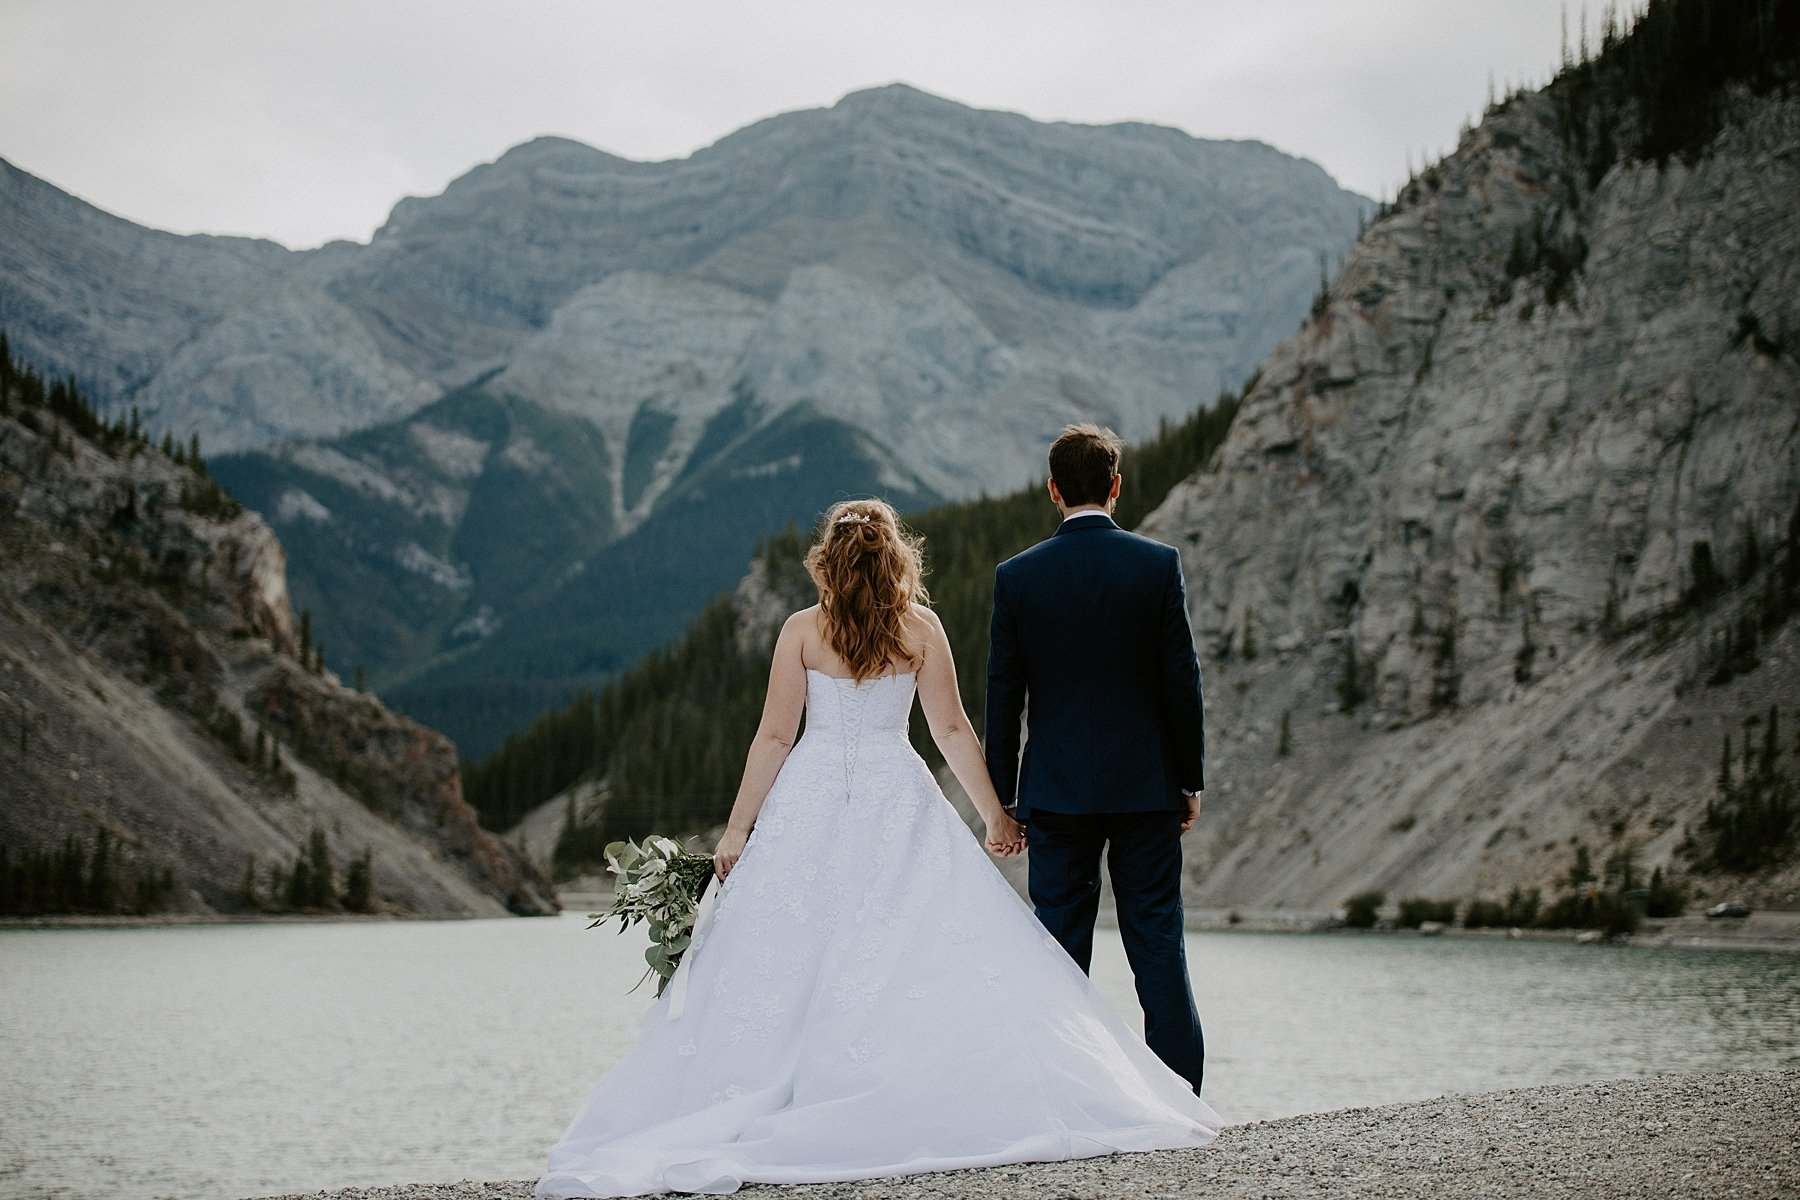 Whitemans pond wedding photos Canmore